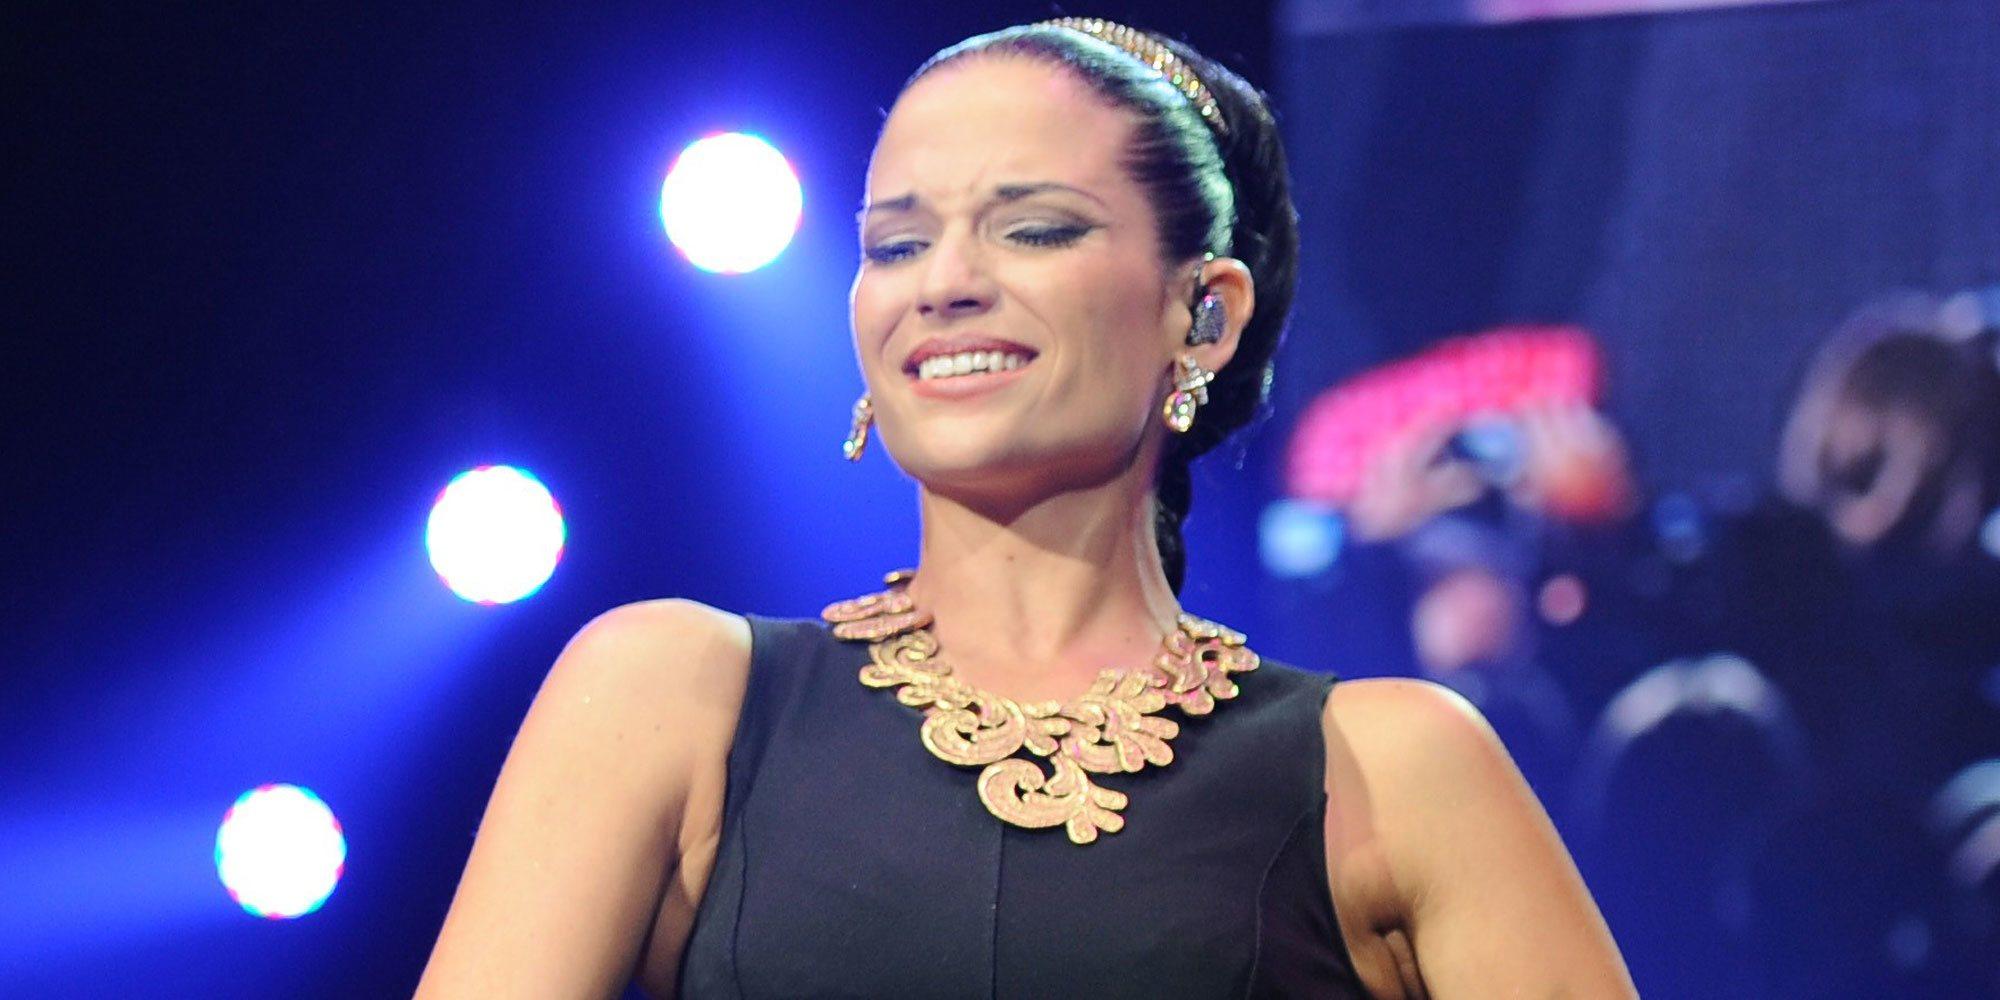 El motivo por el que Natalia Jiménez se divorcia de Daniel Trueba